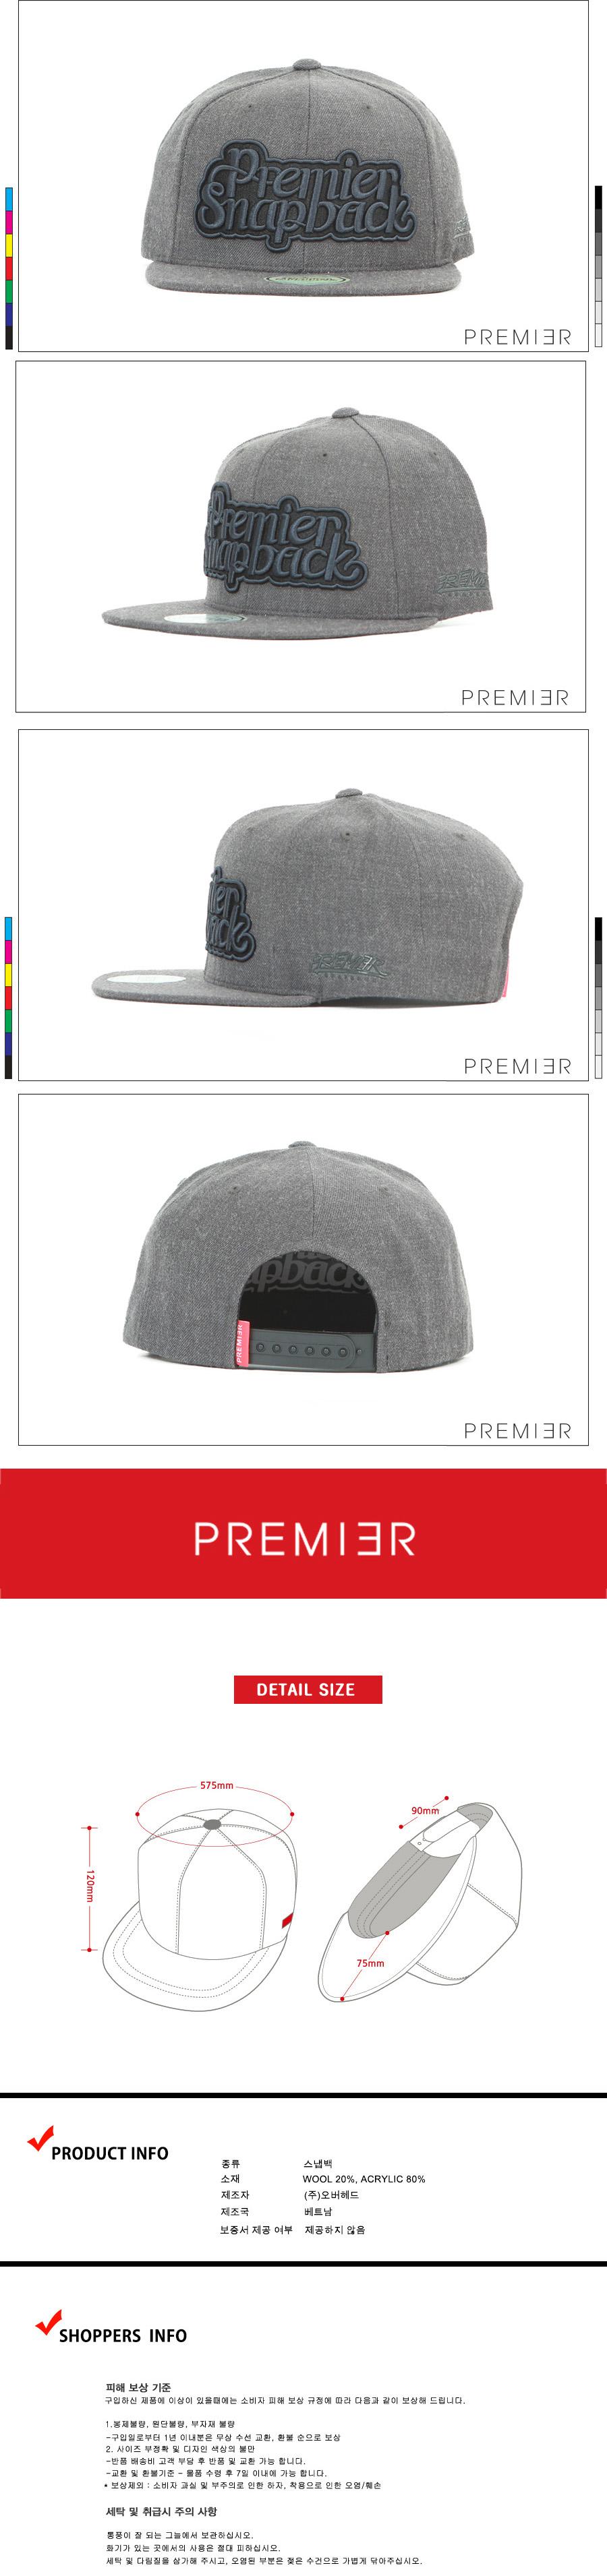 [ PREMIER ] [Premier] Snapback Clear Logo Charcoal (P767)